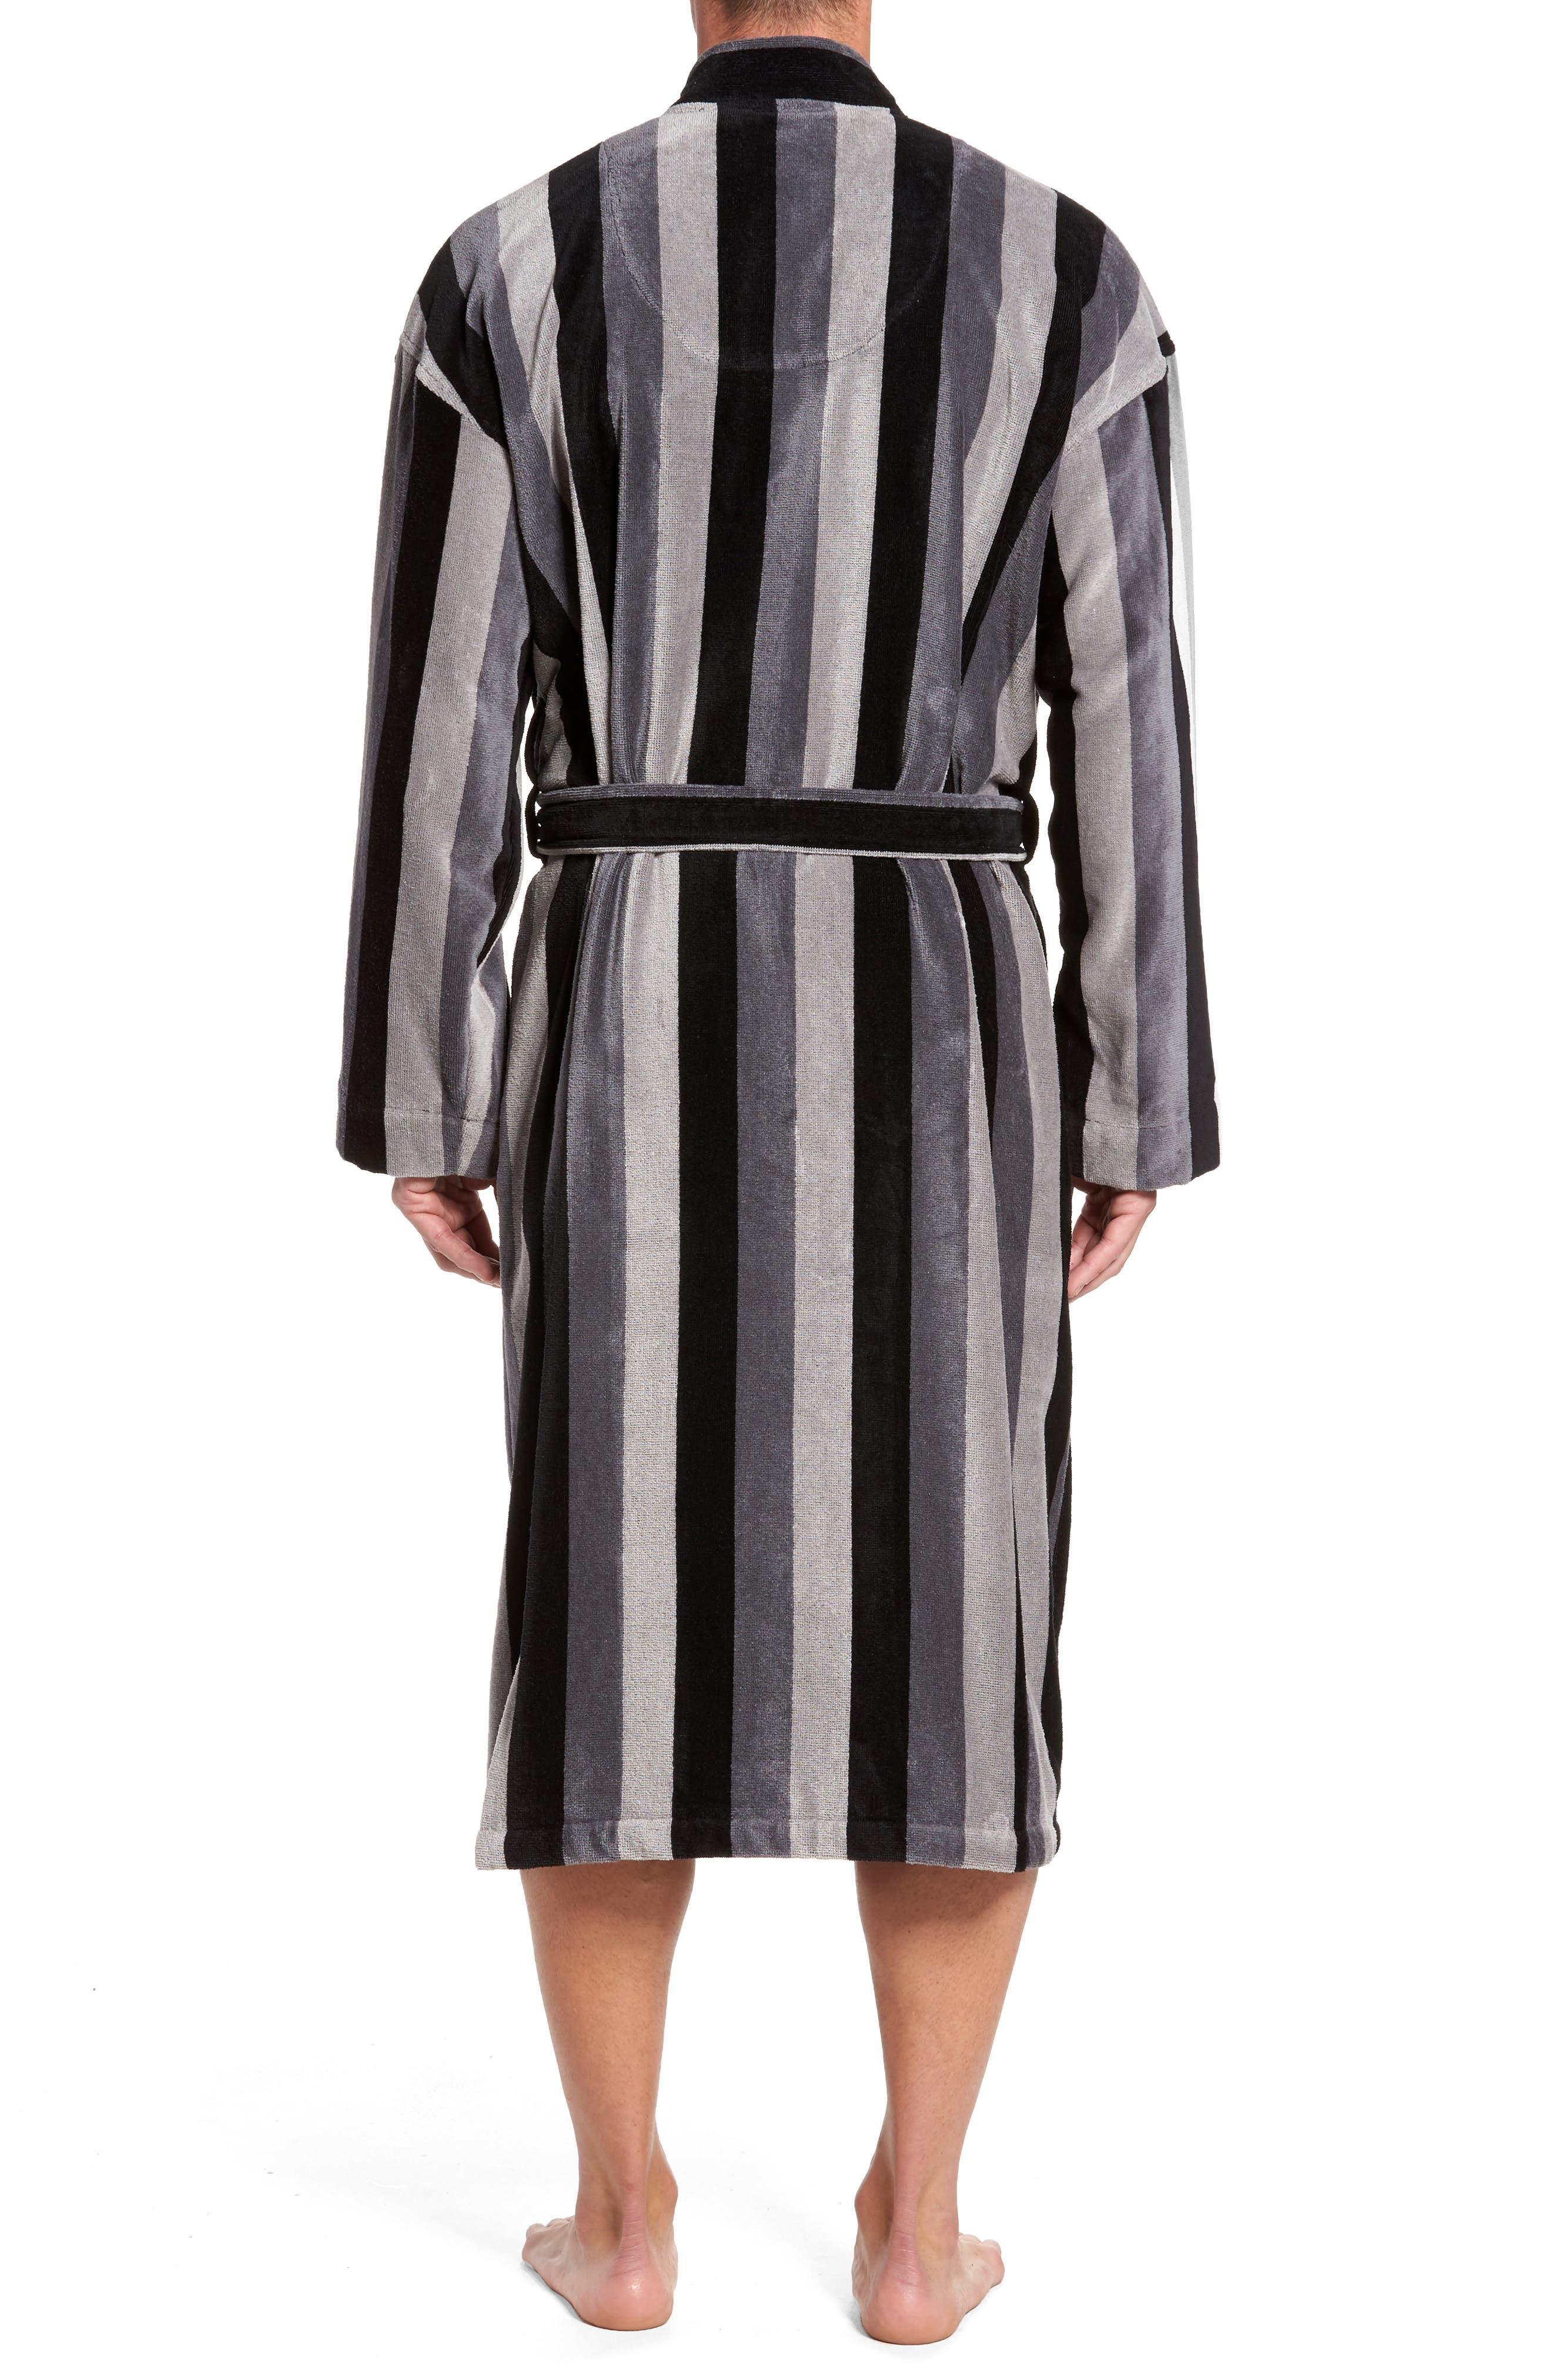 Remarkavelour Robe,                             Alternate thumbnail 2, color,                             001